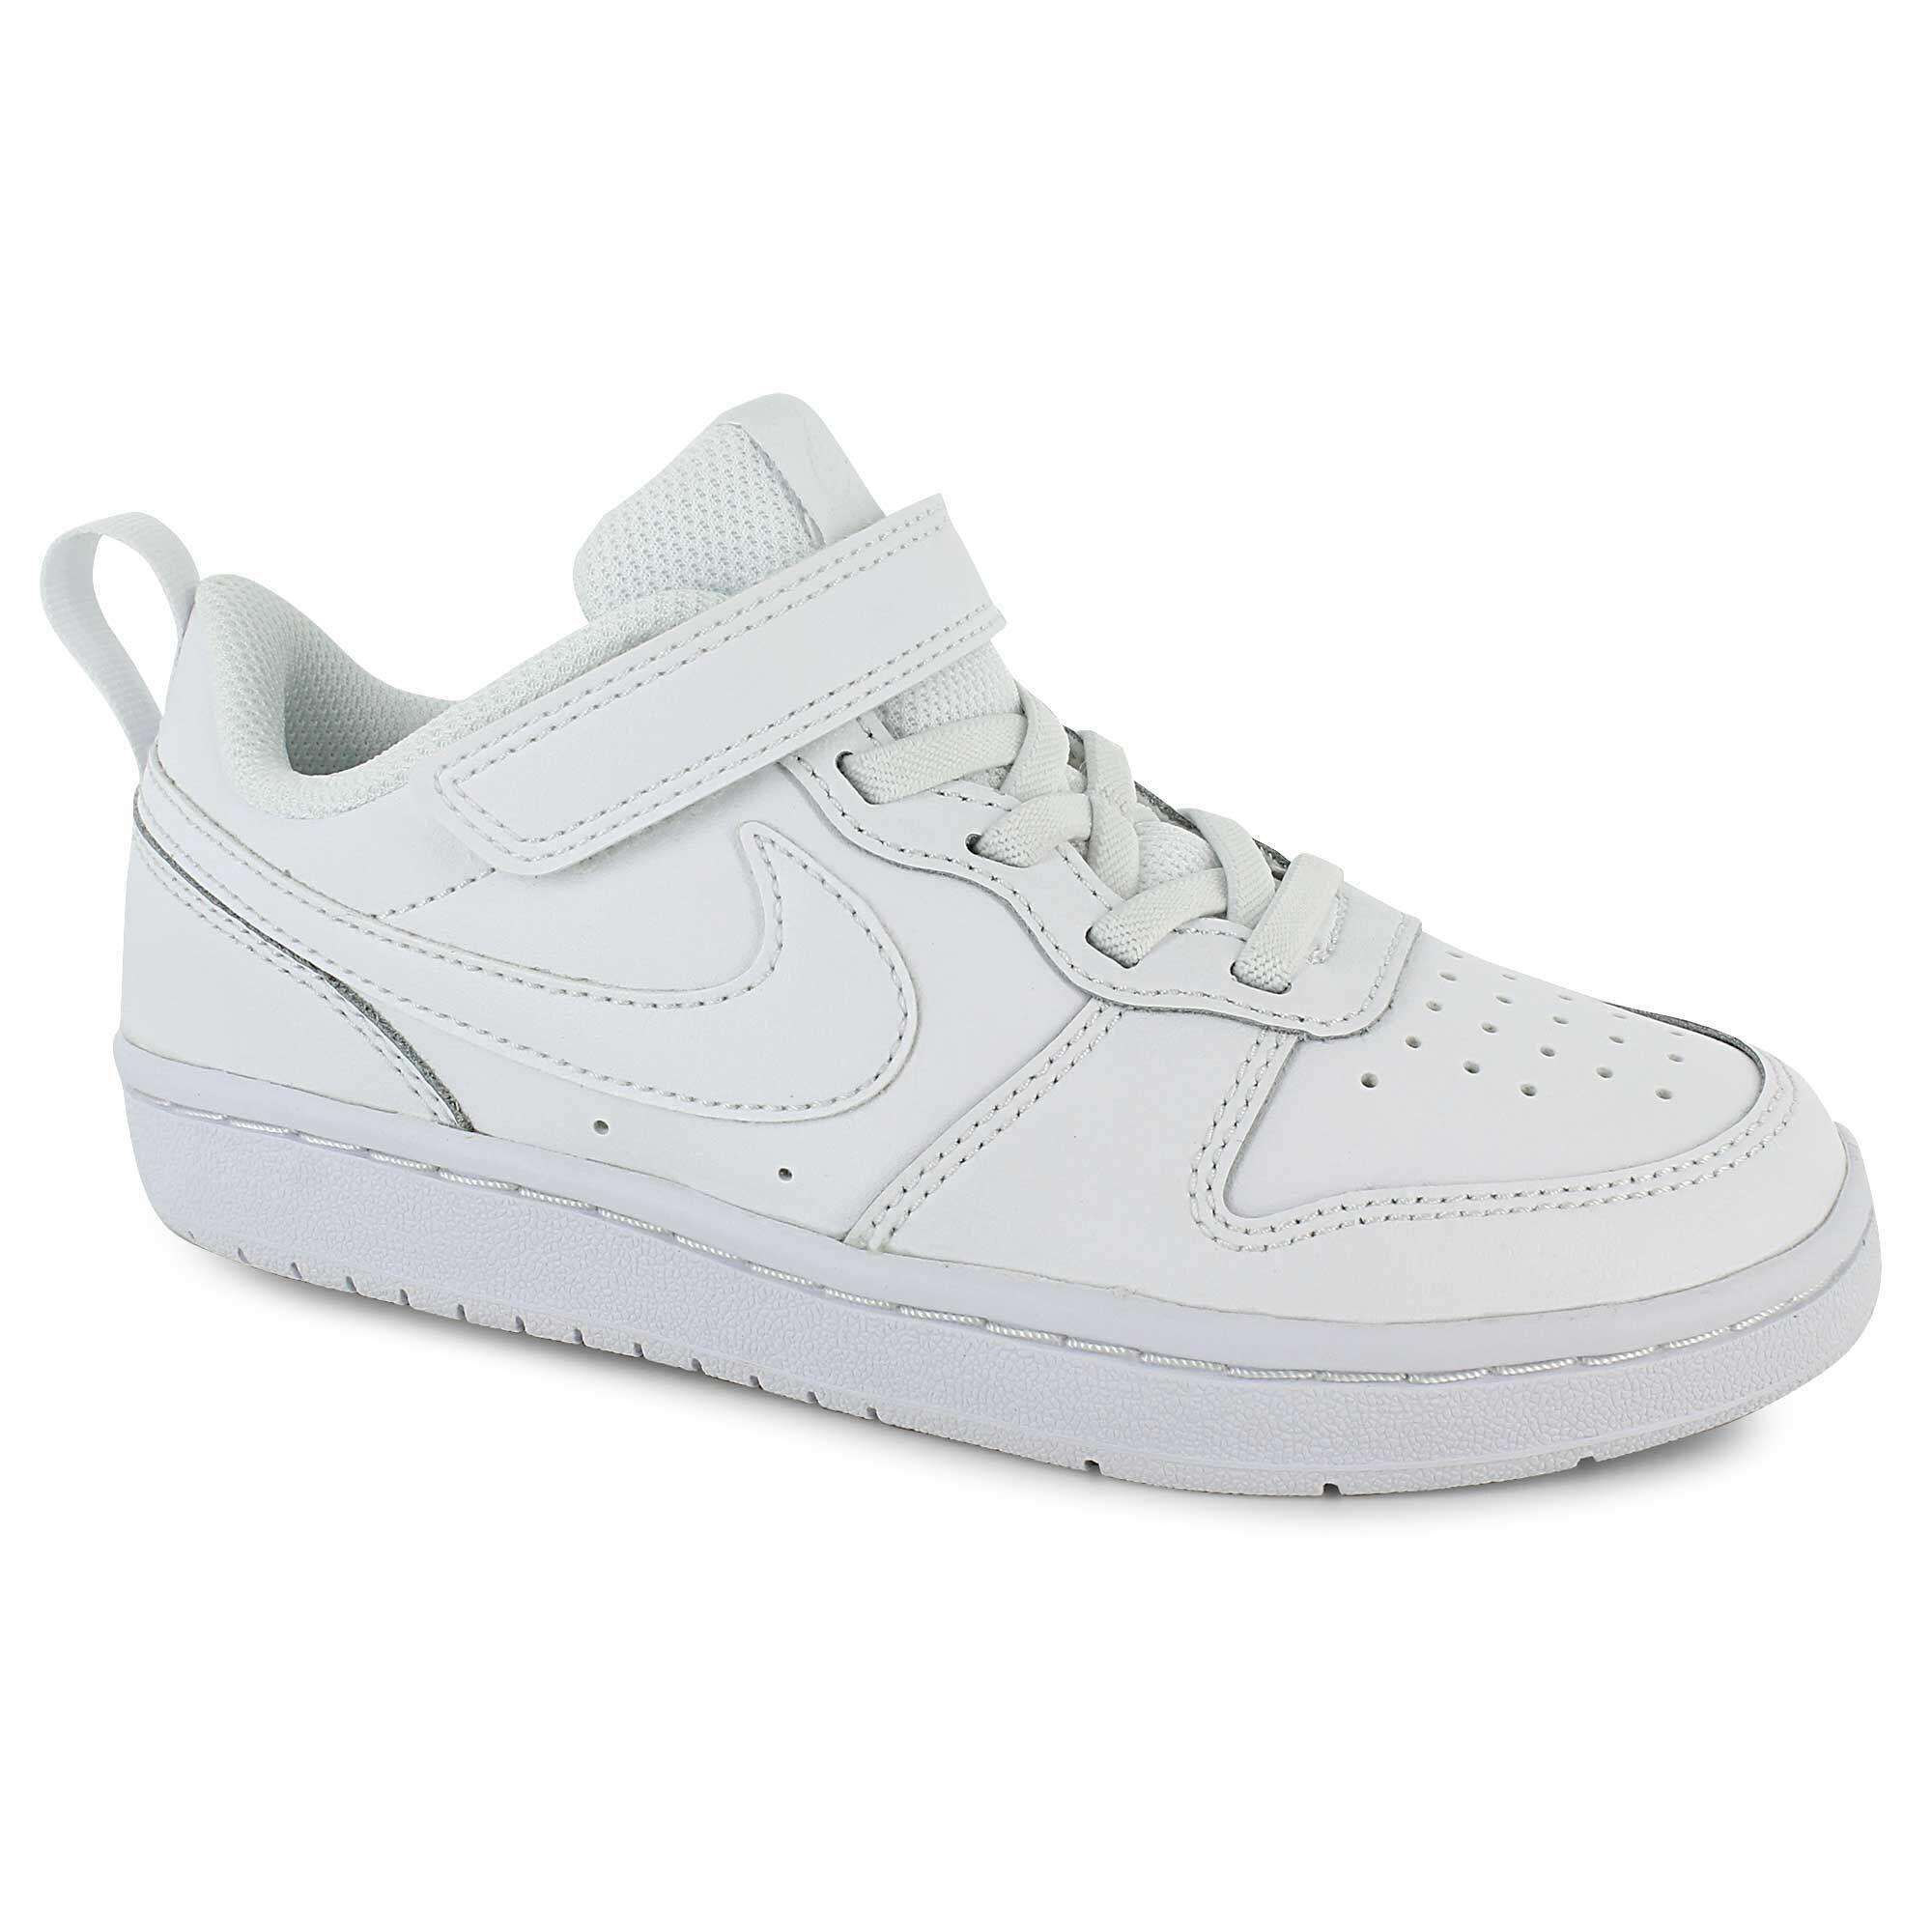 Boys' Athletic Shoes | Shop Now at SHOE